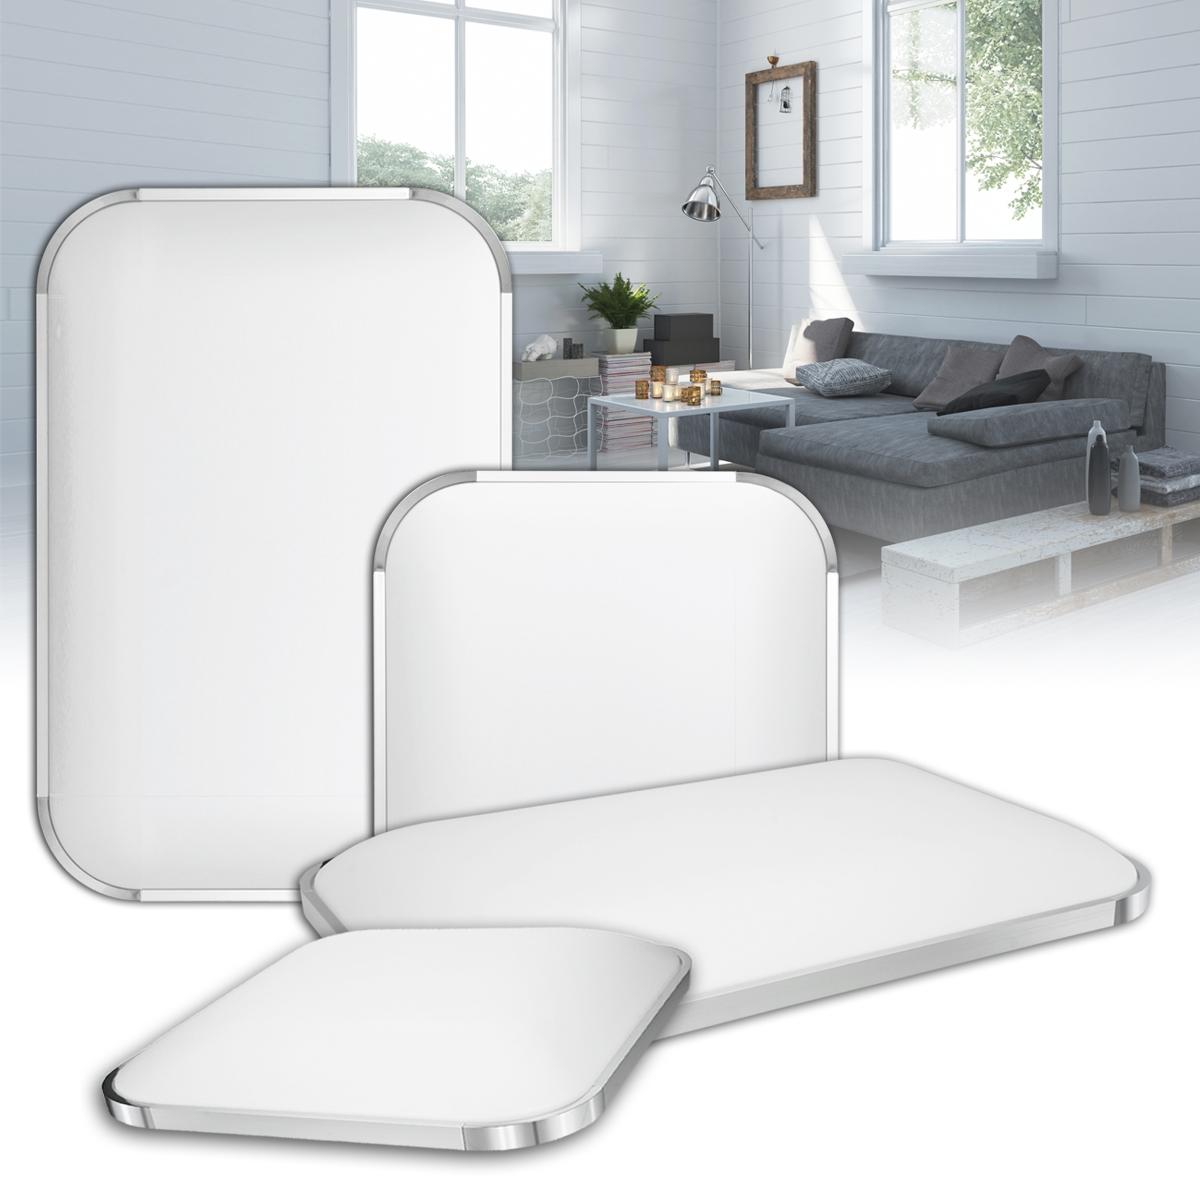 led deckenleuchte deckenlampe aufputzlampe panel. Black Bedroom Furniture Sets. Home Design Ideas